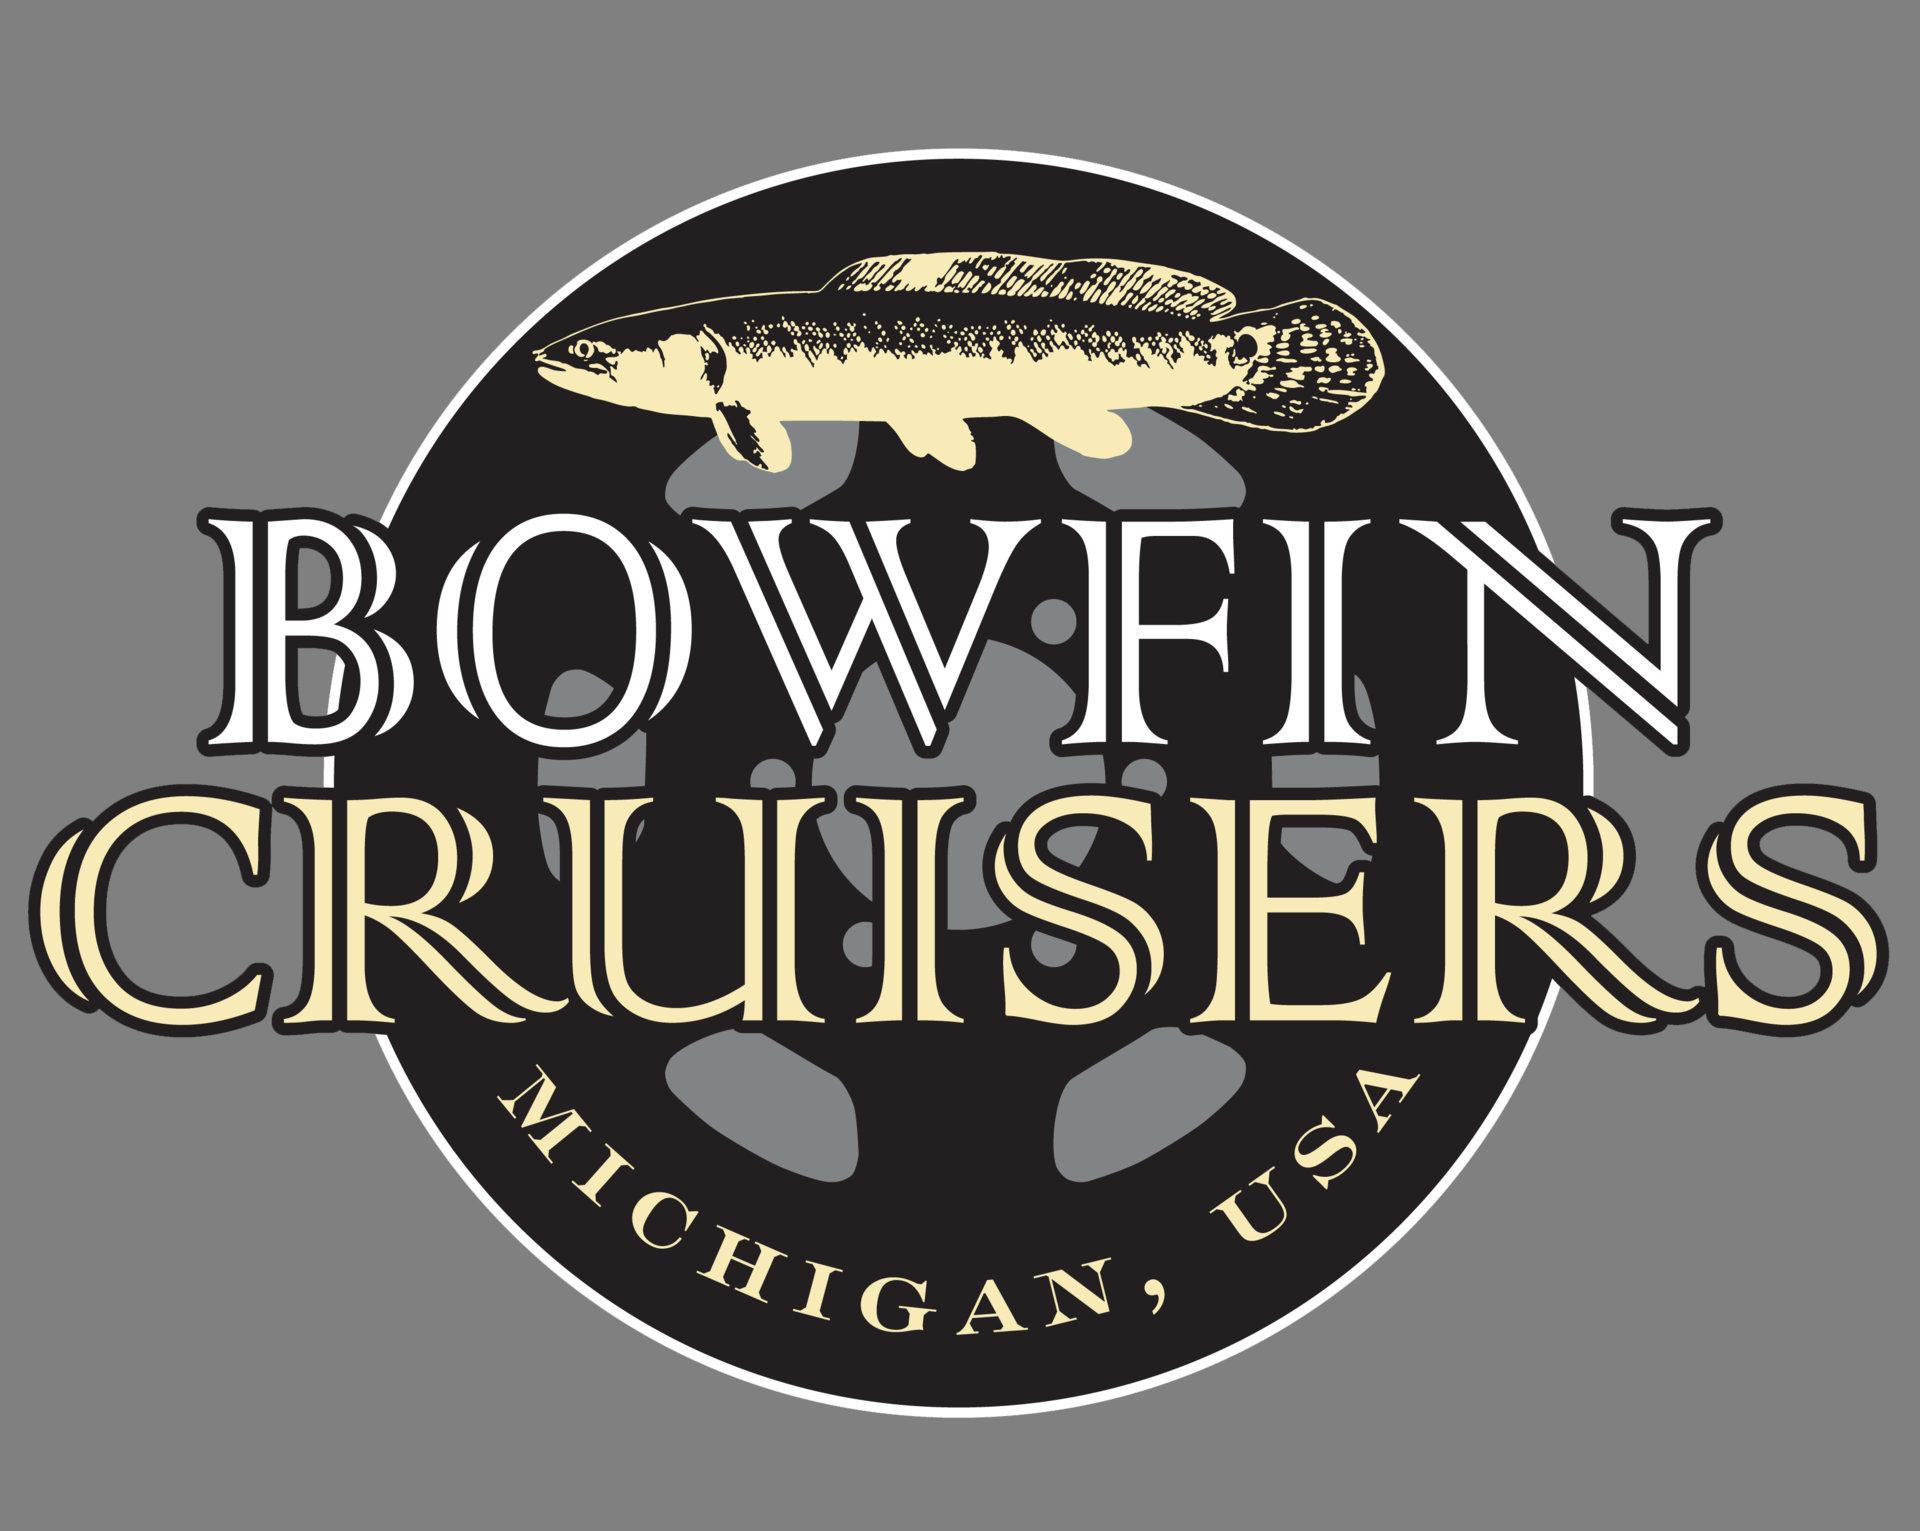 Bowfin_logo_FINAL_2017.jpg